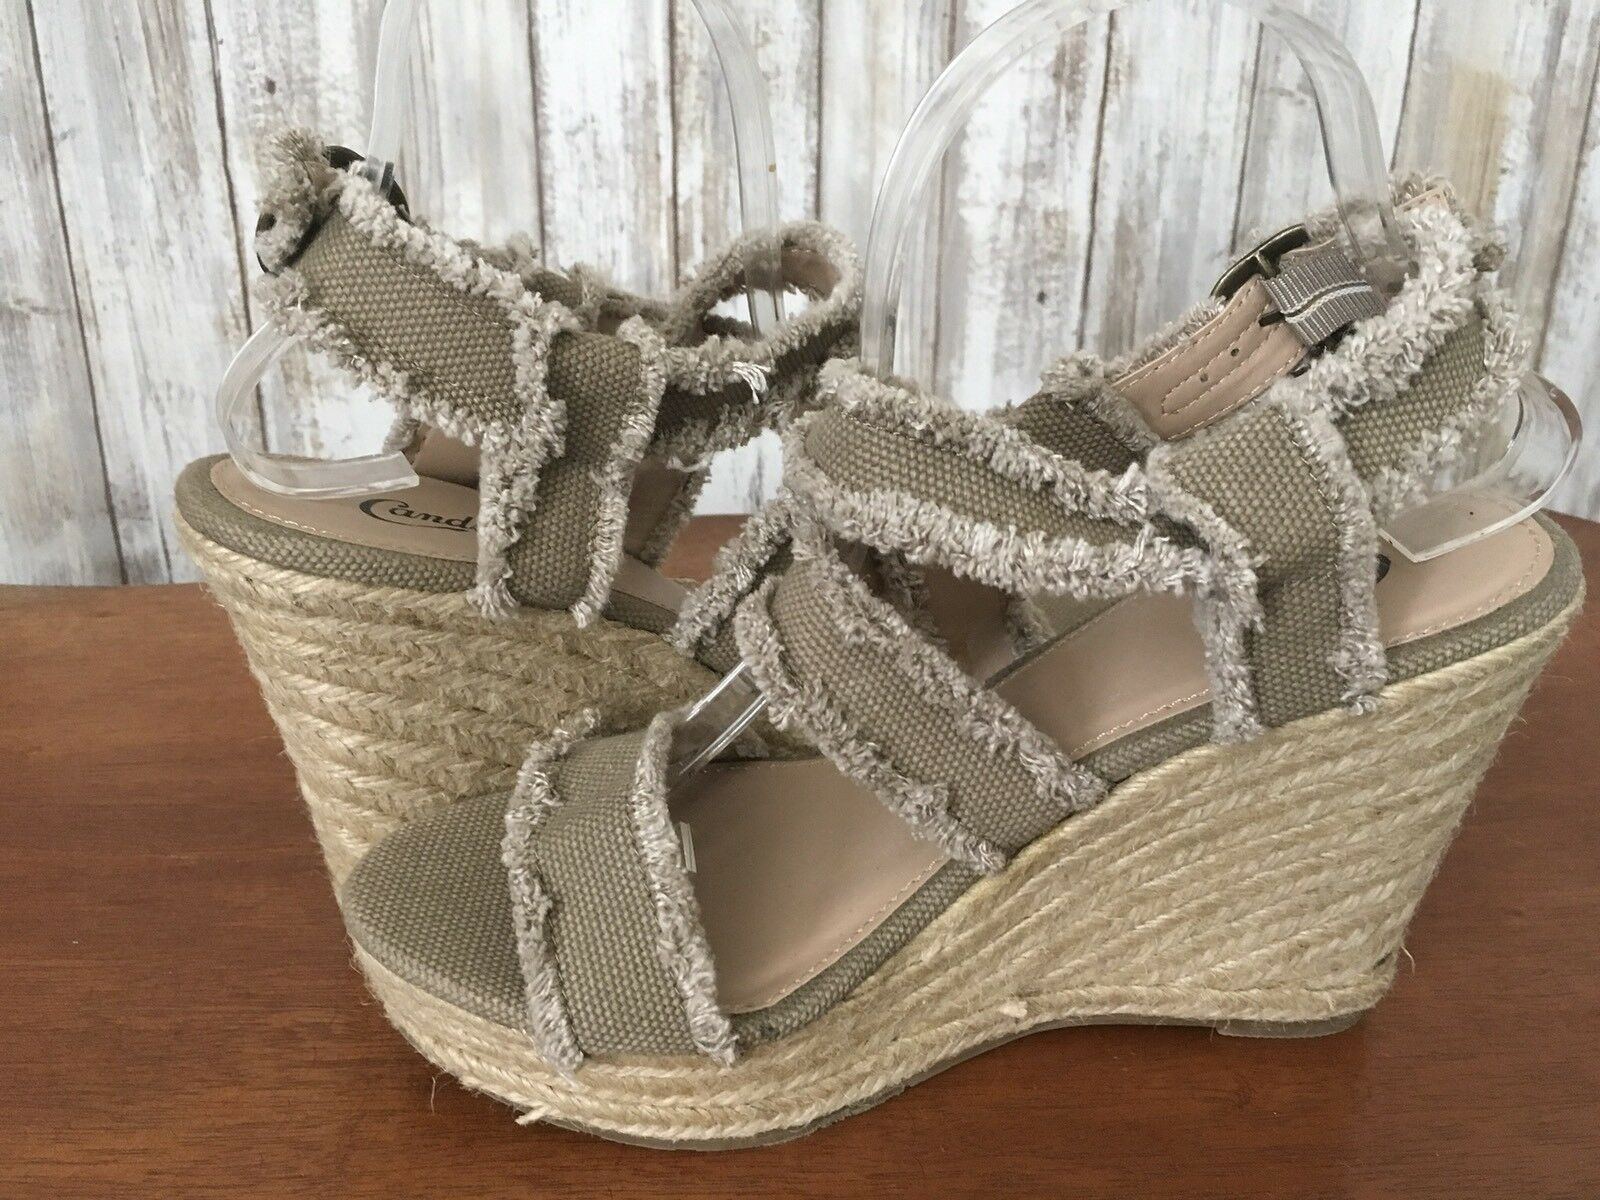 NEW Nine West sandal heel tan/orange Beautiful!  Size 10 Braided  NW7STARE